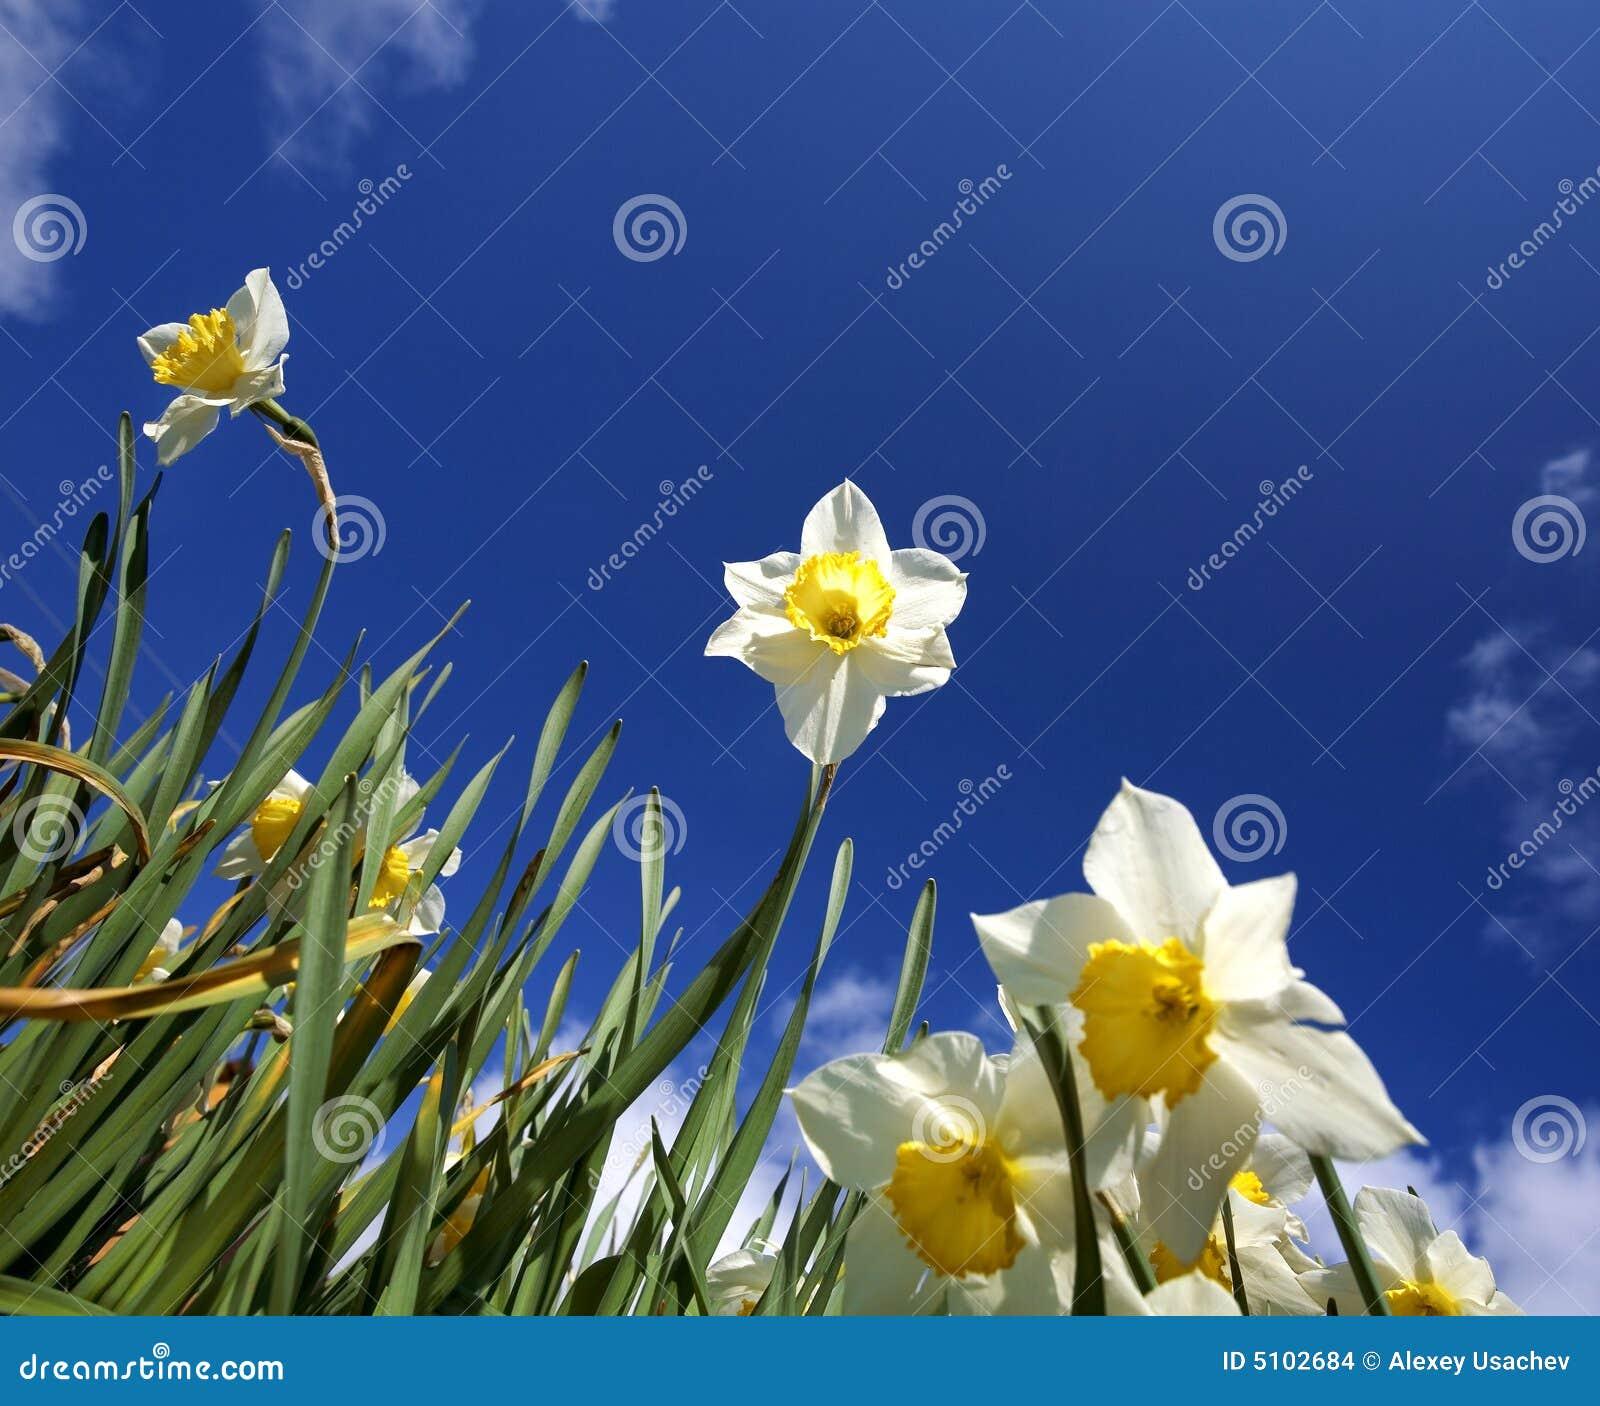 Flowers. spring.sky